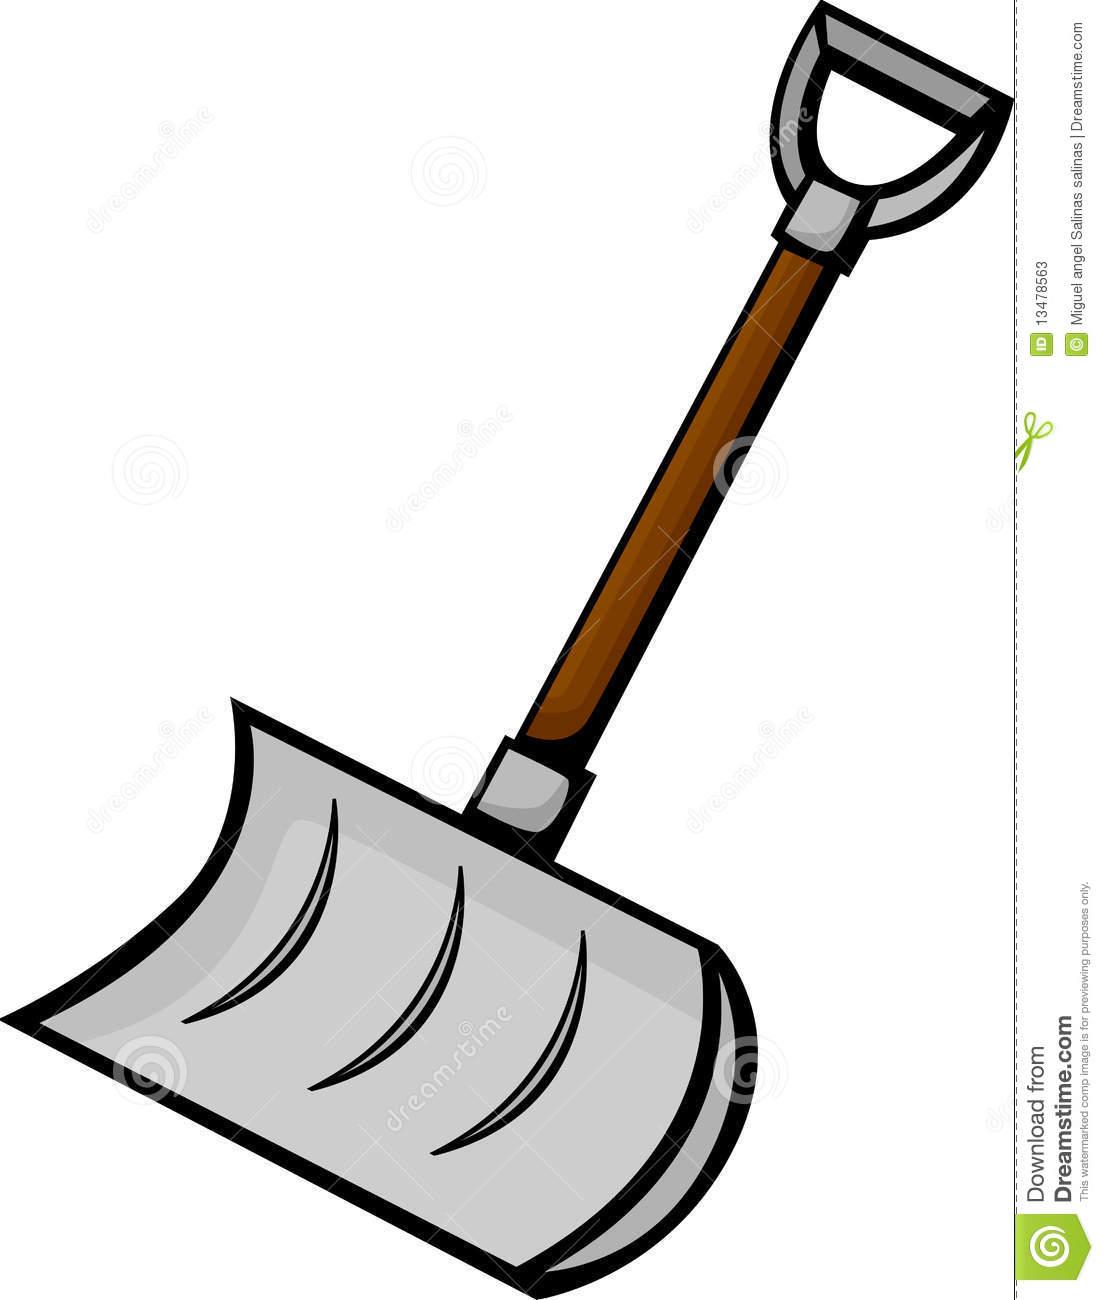 Snow Shovel Vector Illustration Stock Ph-Snow Shovel Vector Illustration Stock Photos Image 13478563-2